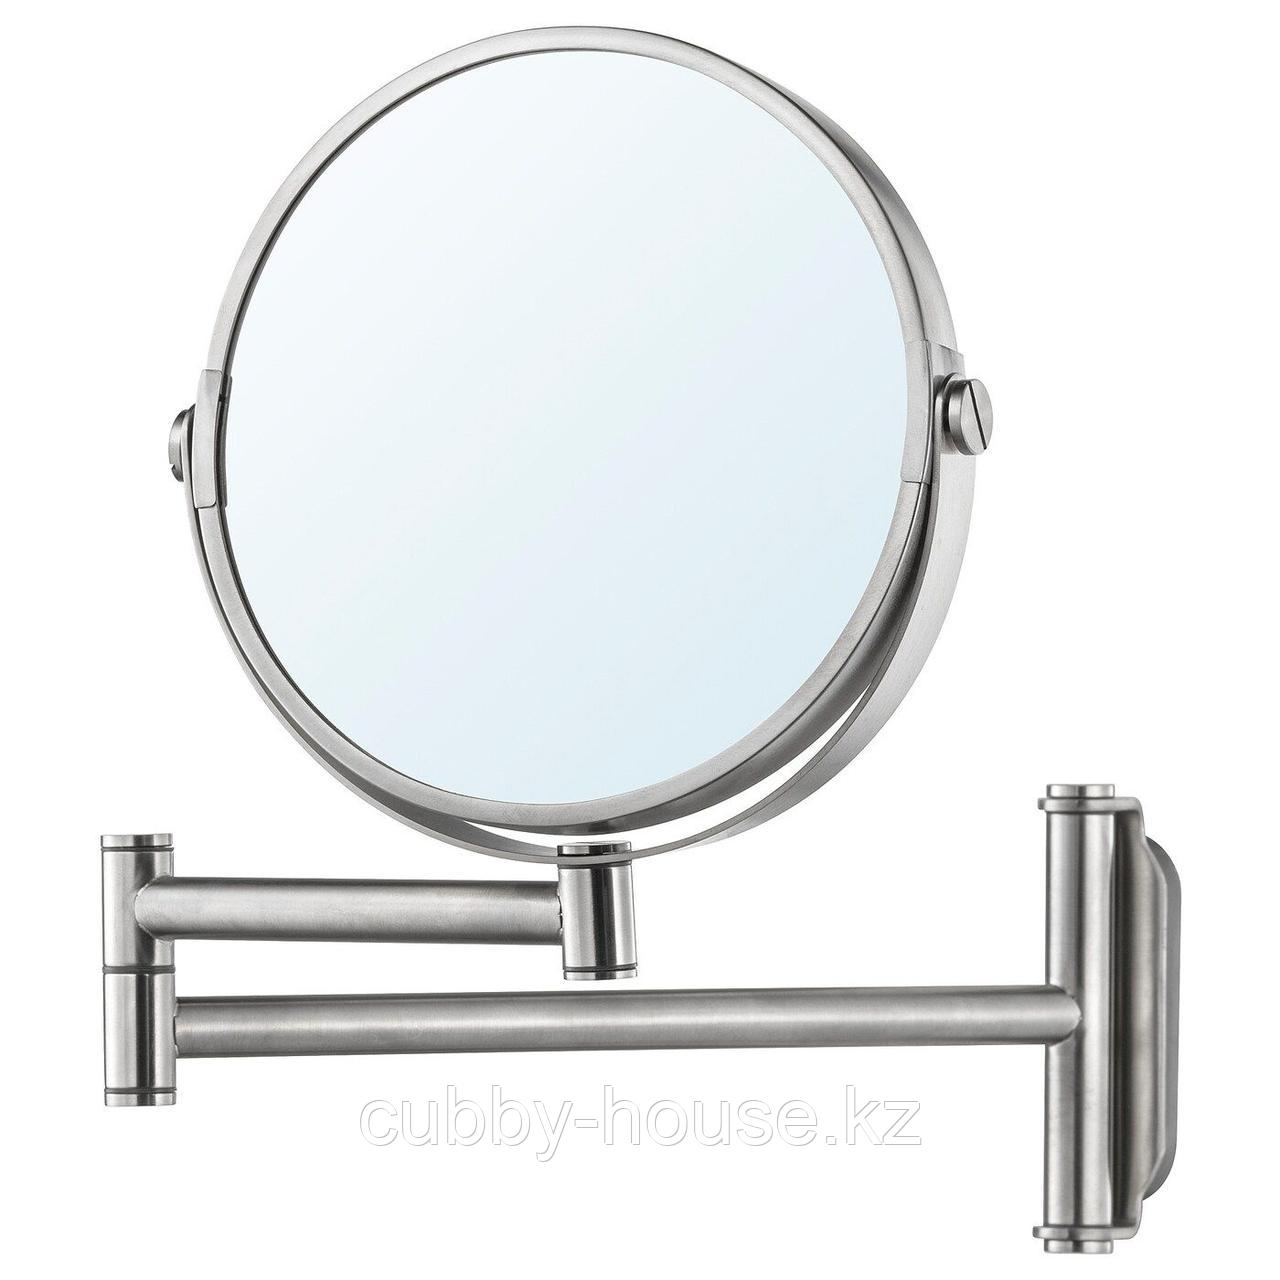 БРОГРУНД Зеркало, нержавеющ сталь, 3x27 см